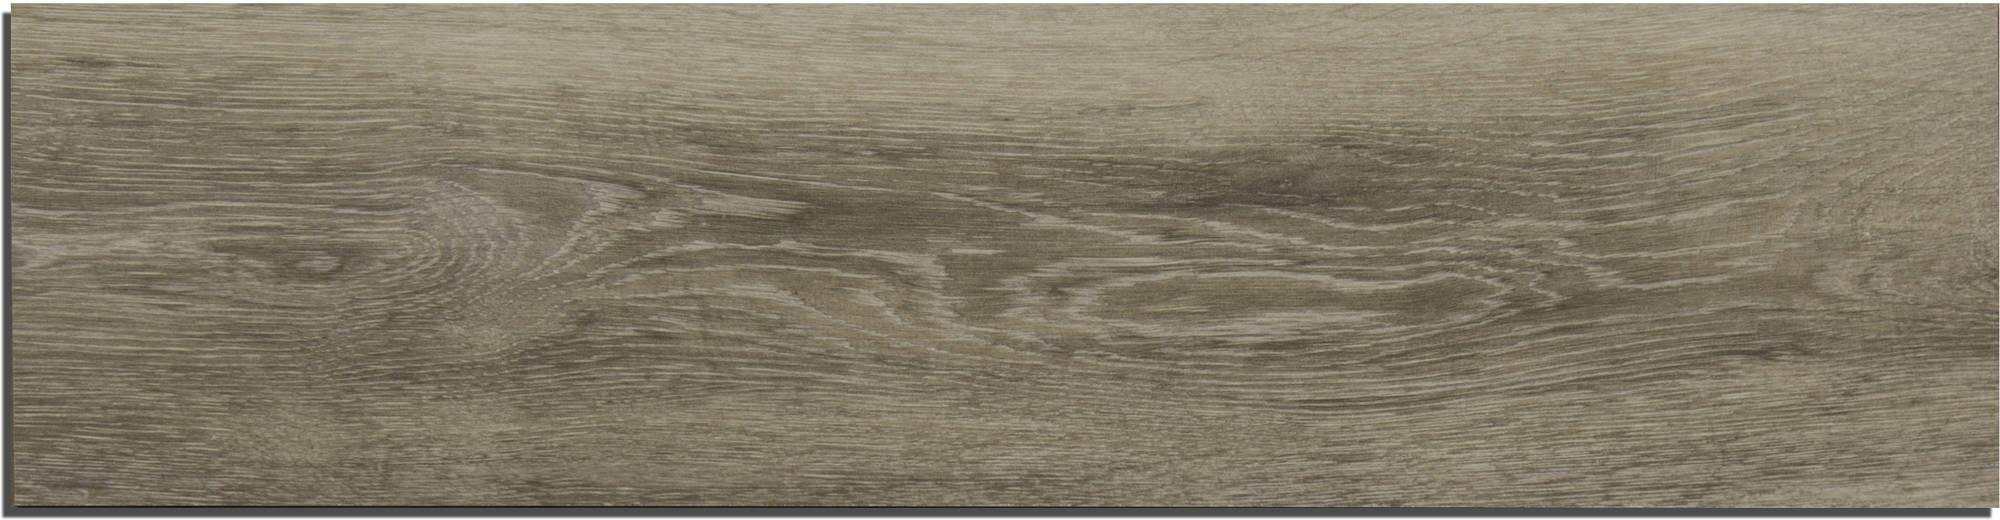 Vloertegel El Halcon Atelier 15,4x60x- cm Wengue 0,93 M2